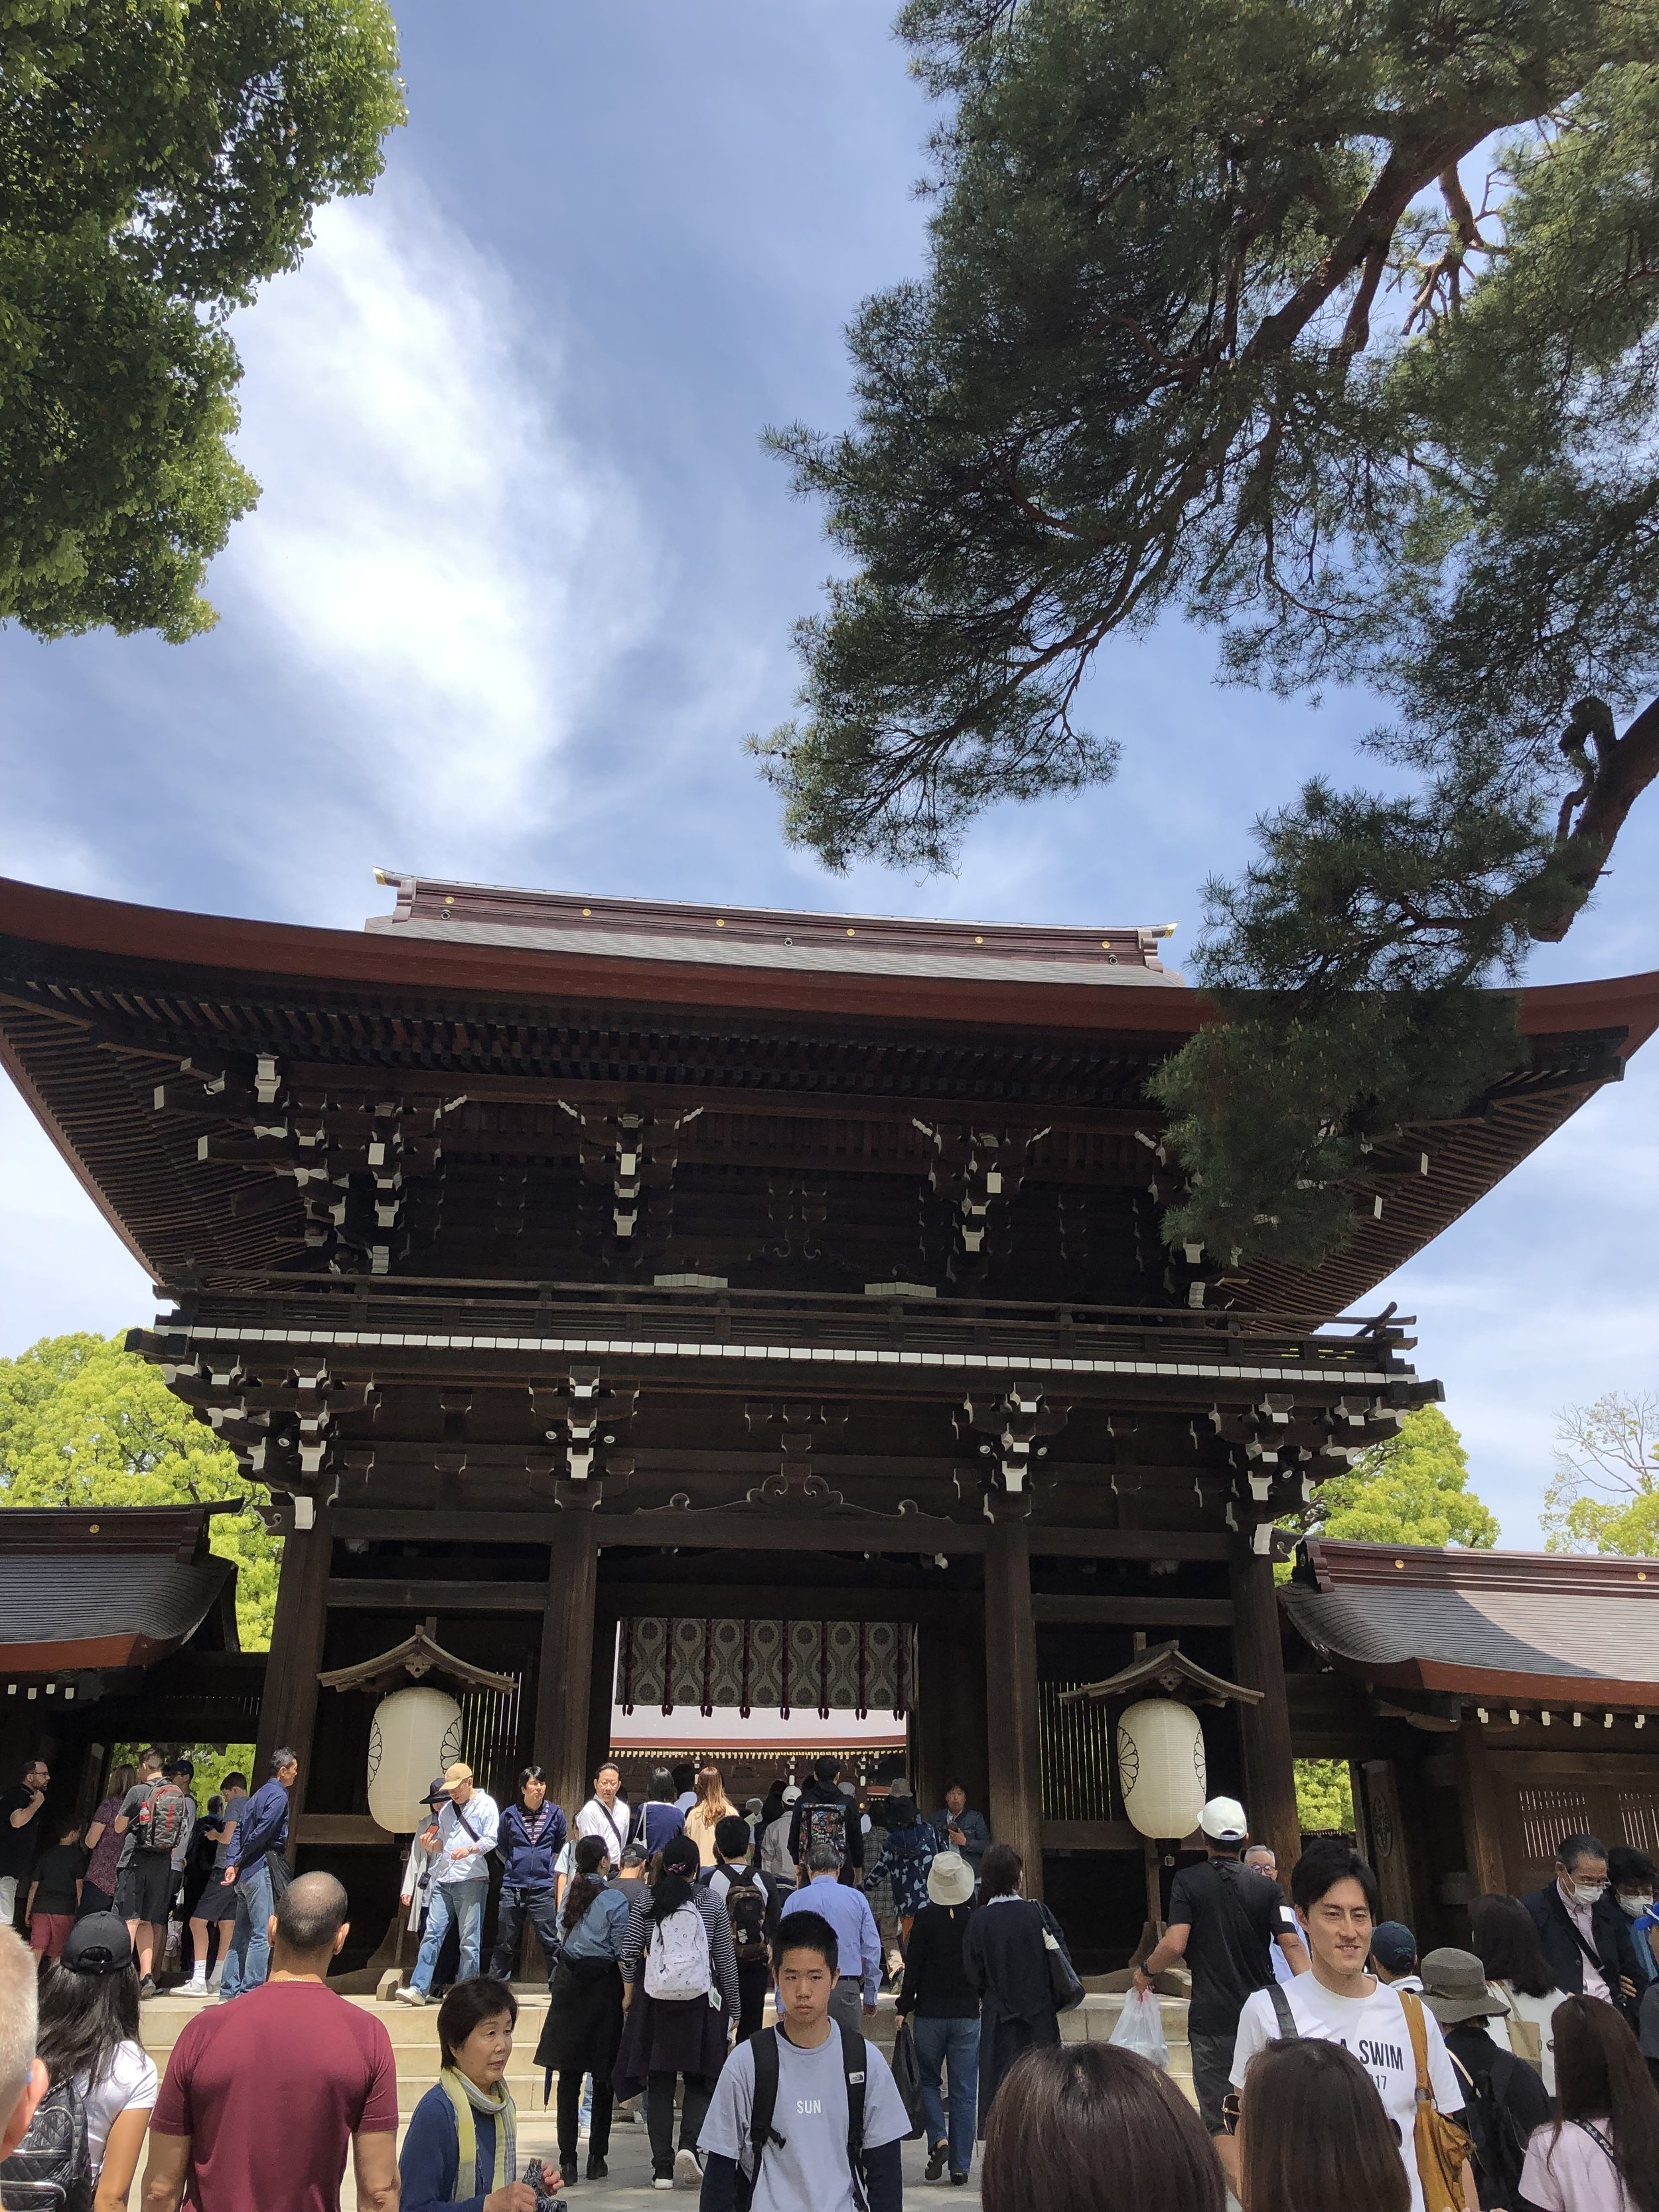 Meiji Shrine - crowds courtesy of coronation of new Emporer